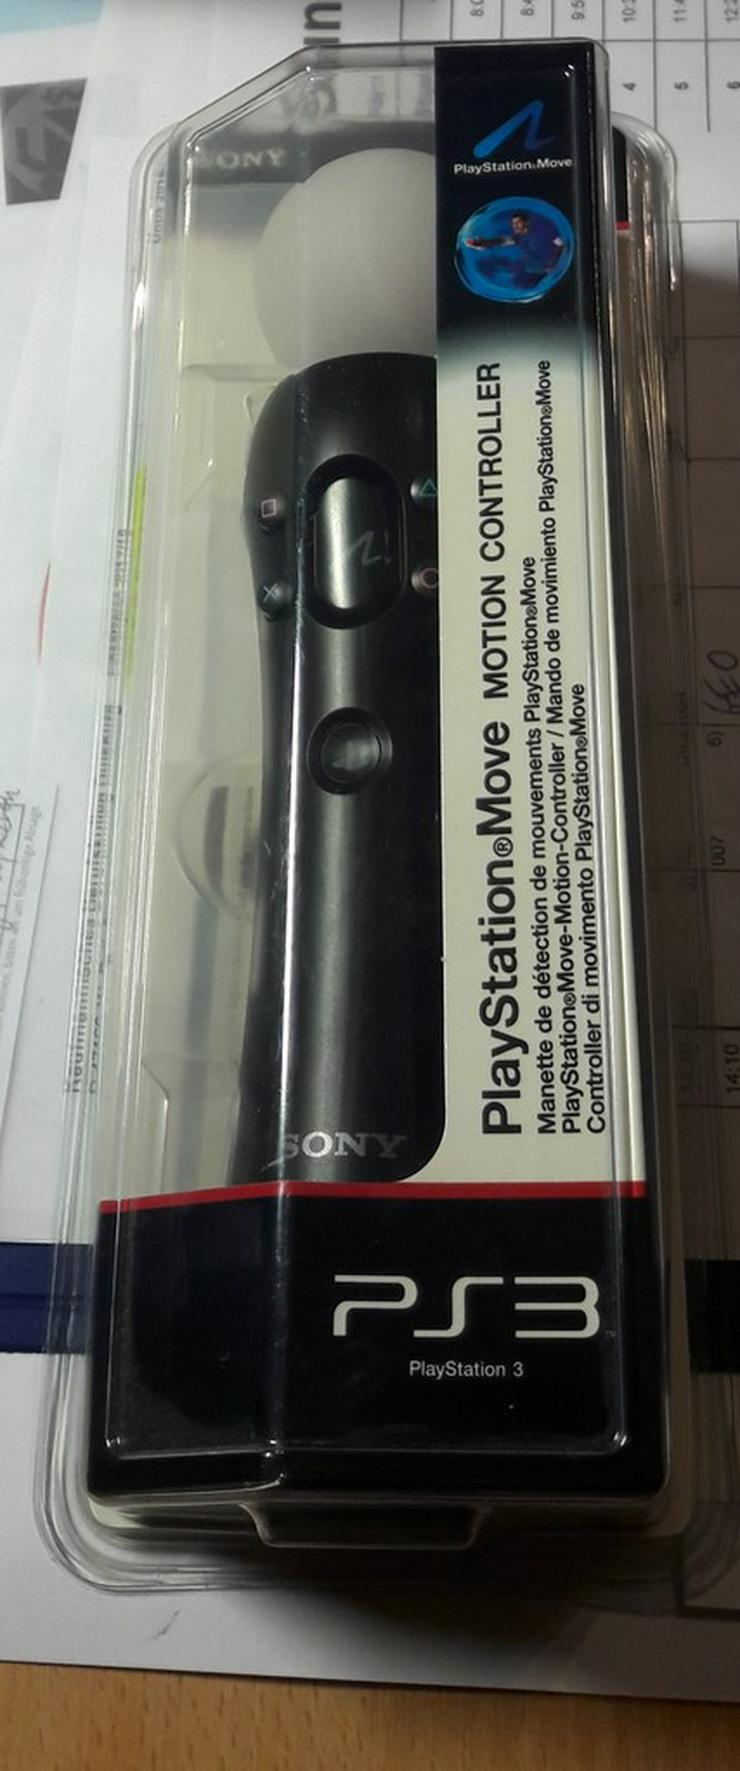 Originaler PlayStation 3 Move Motion-Controller - PlayStation Konsolen & Controller - Bild 1